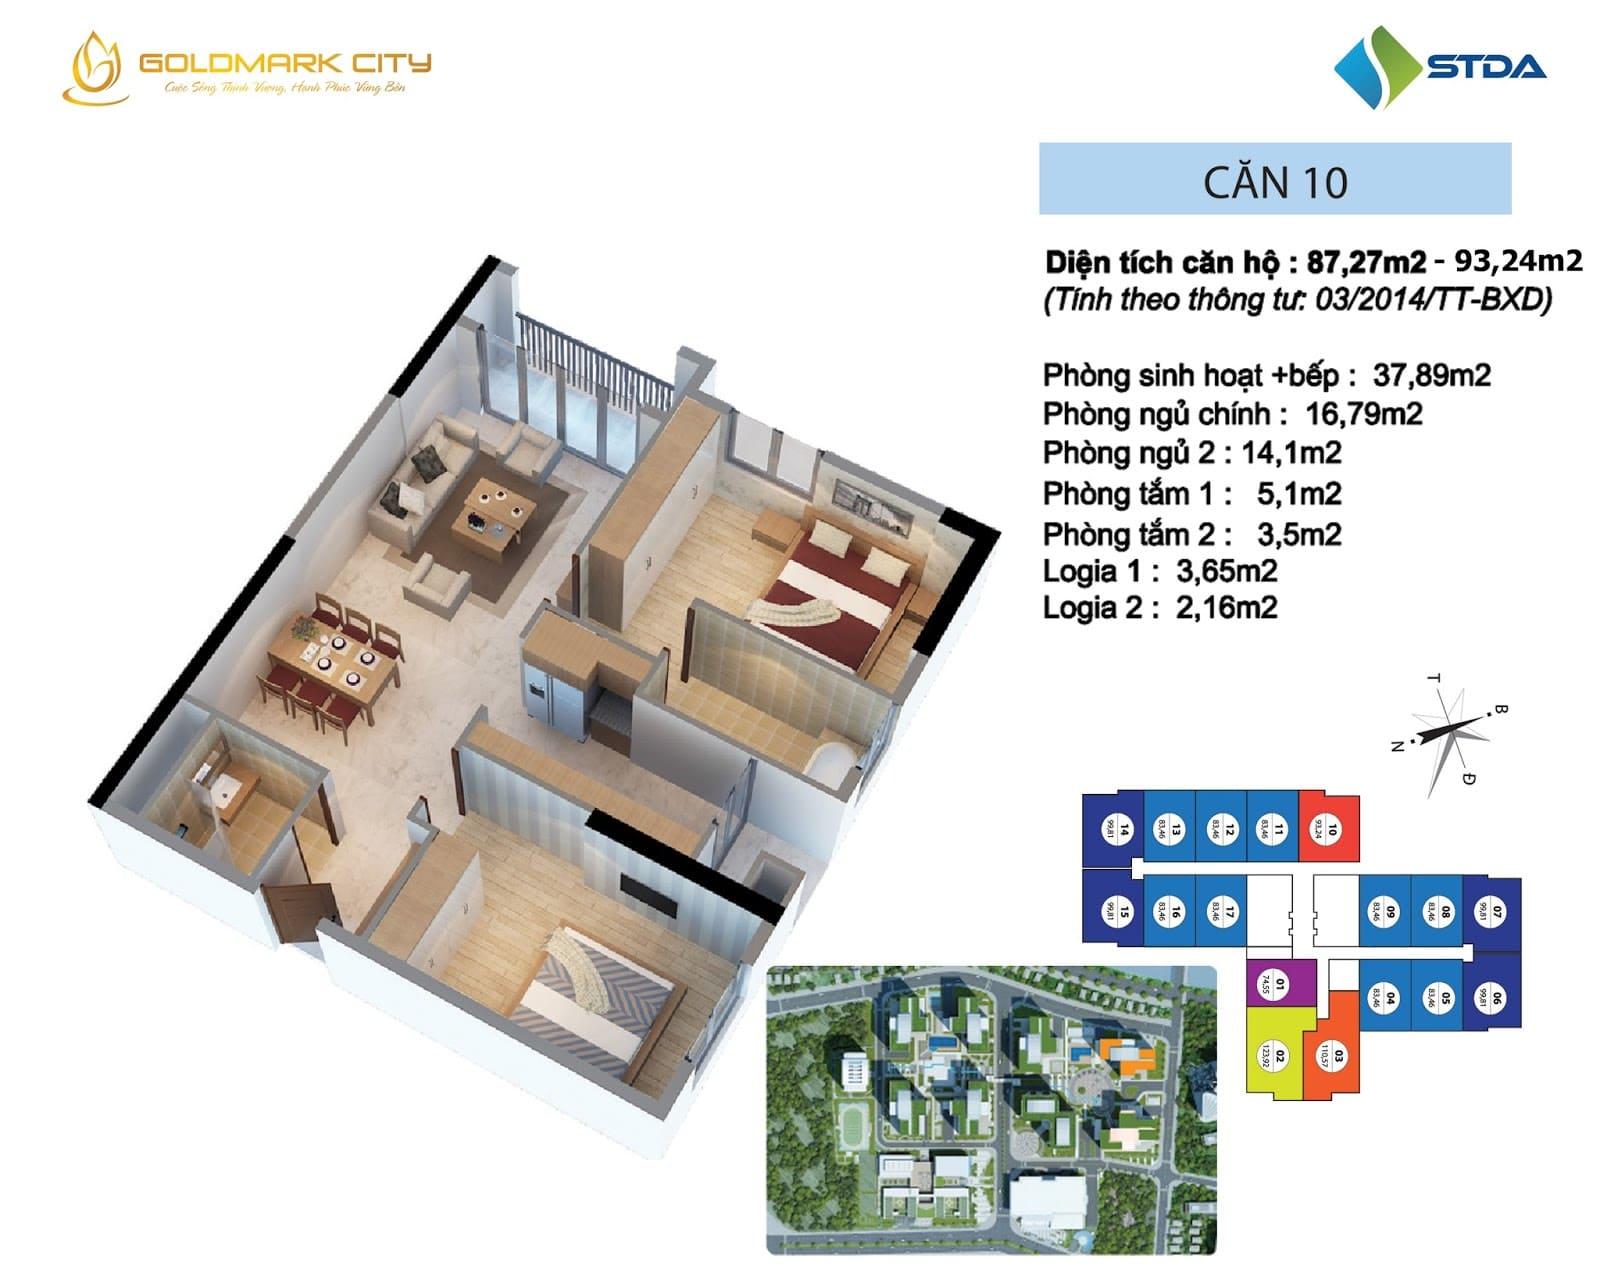 Mặt bằng căn hộ số 10 Ruby 2- Goldmark City 136 Hồ Tùng Mậu